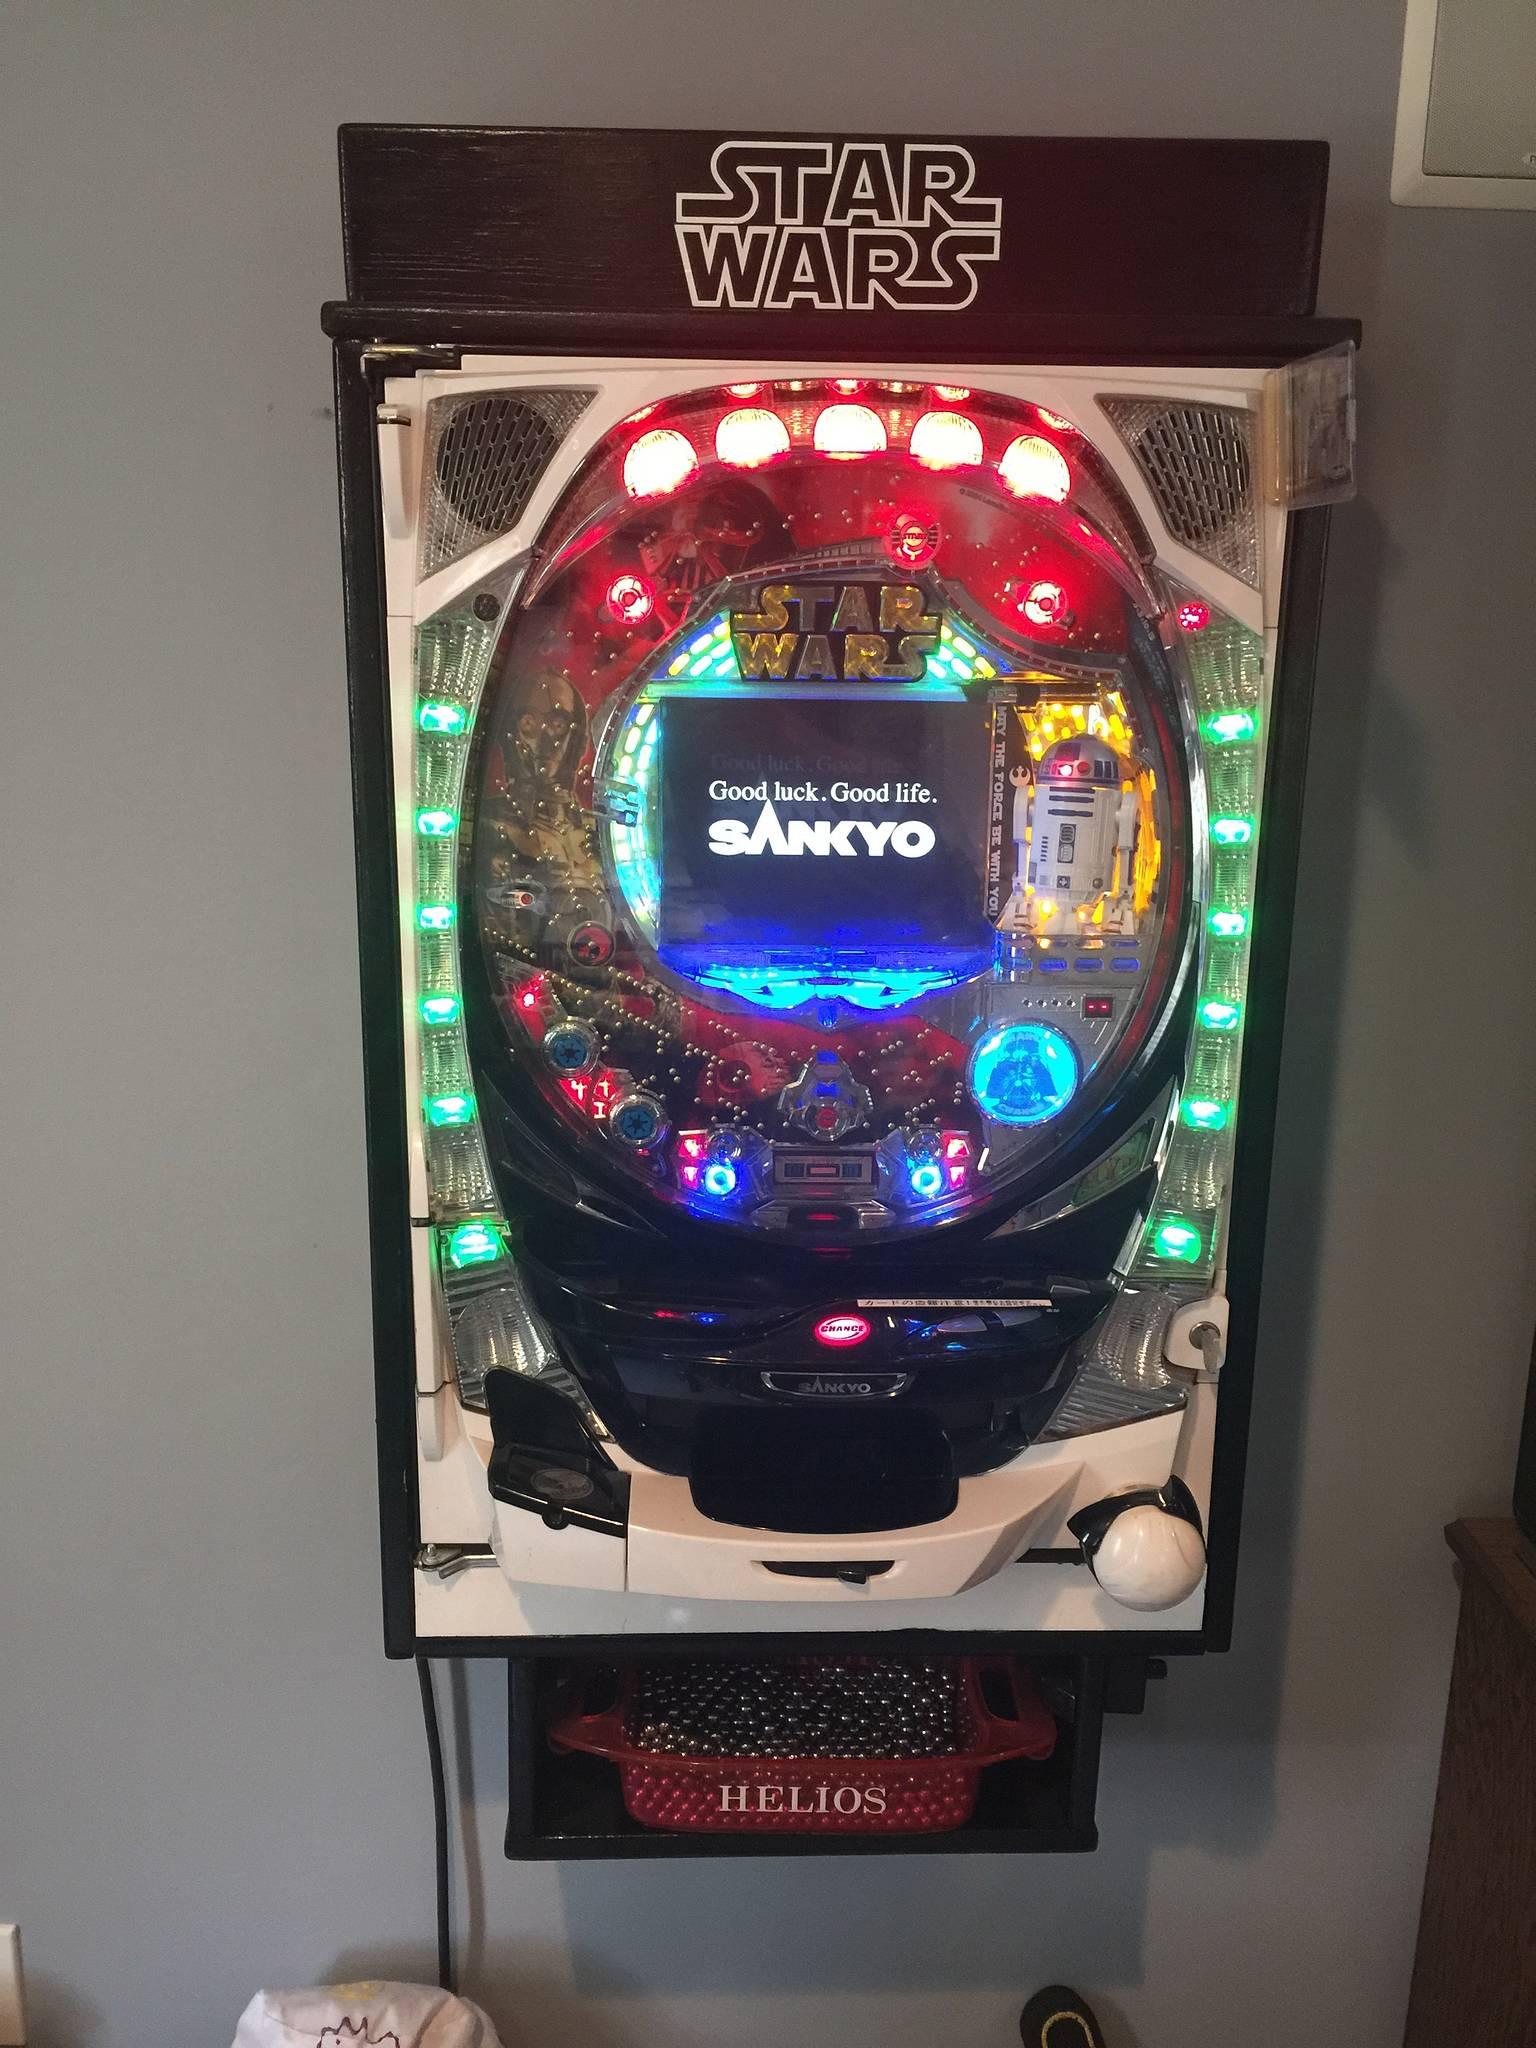 wars pachinko machine for sale